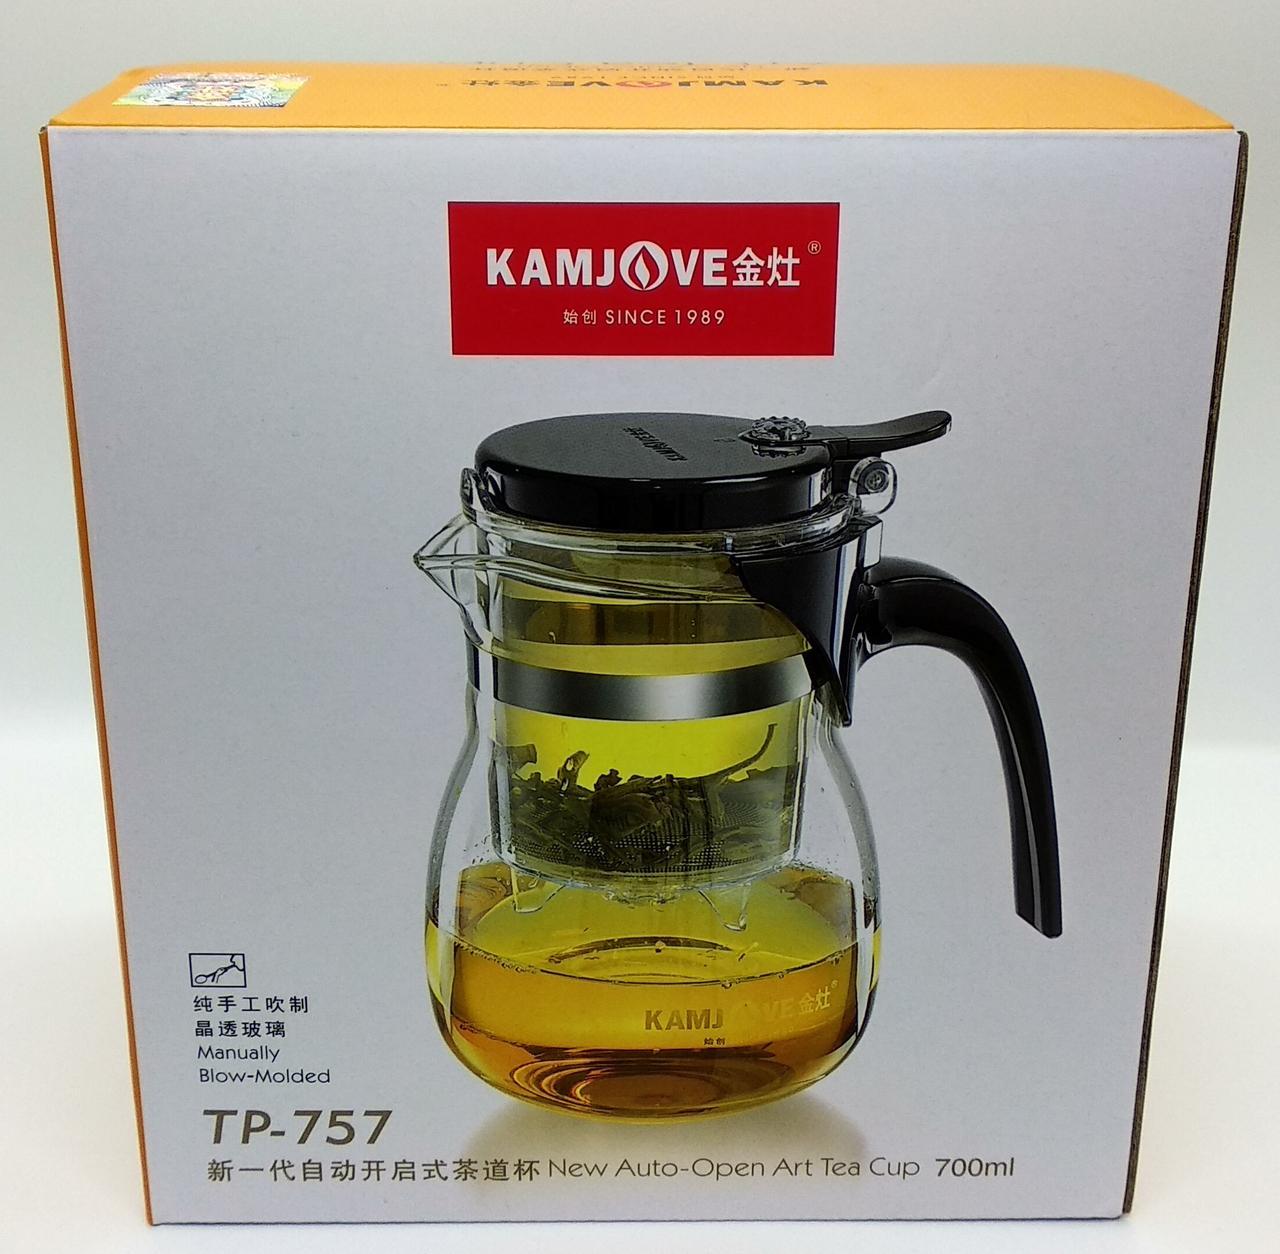 Заварочный чайник Гунфу Kamjove 700 мл (TP-757). Лучшая цена!